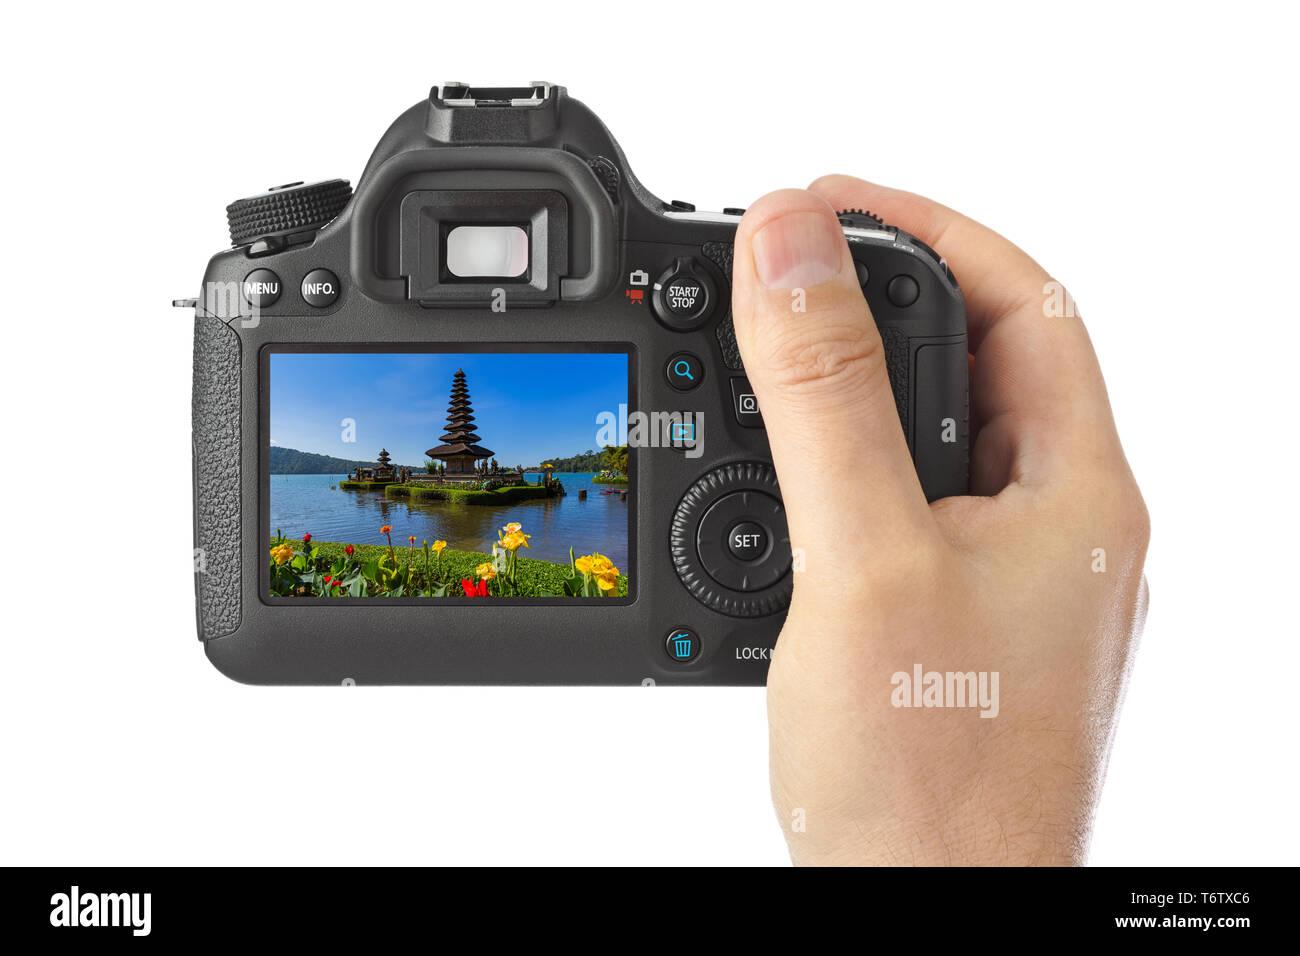 Ib Stock Photos & Ib Stock Images - Alamy